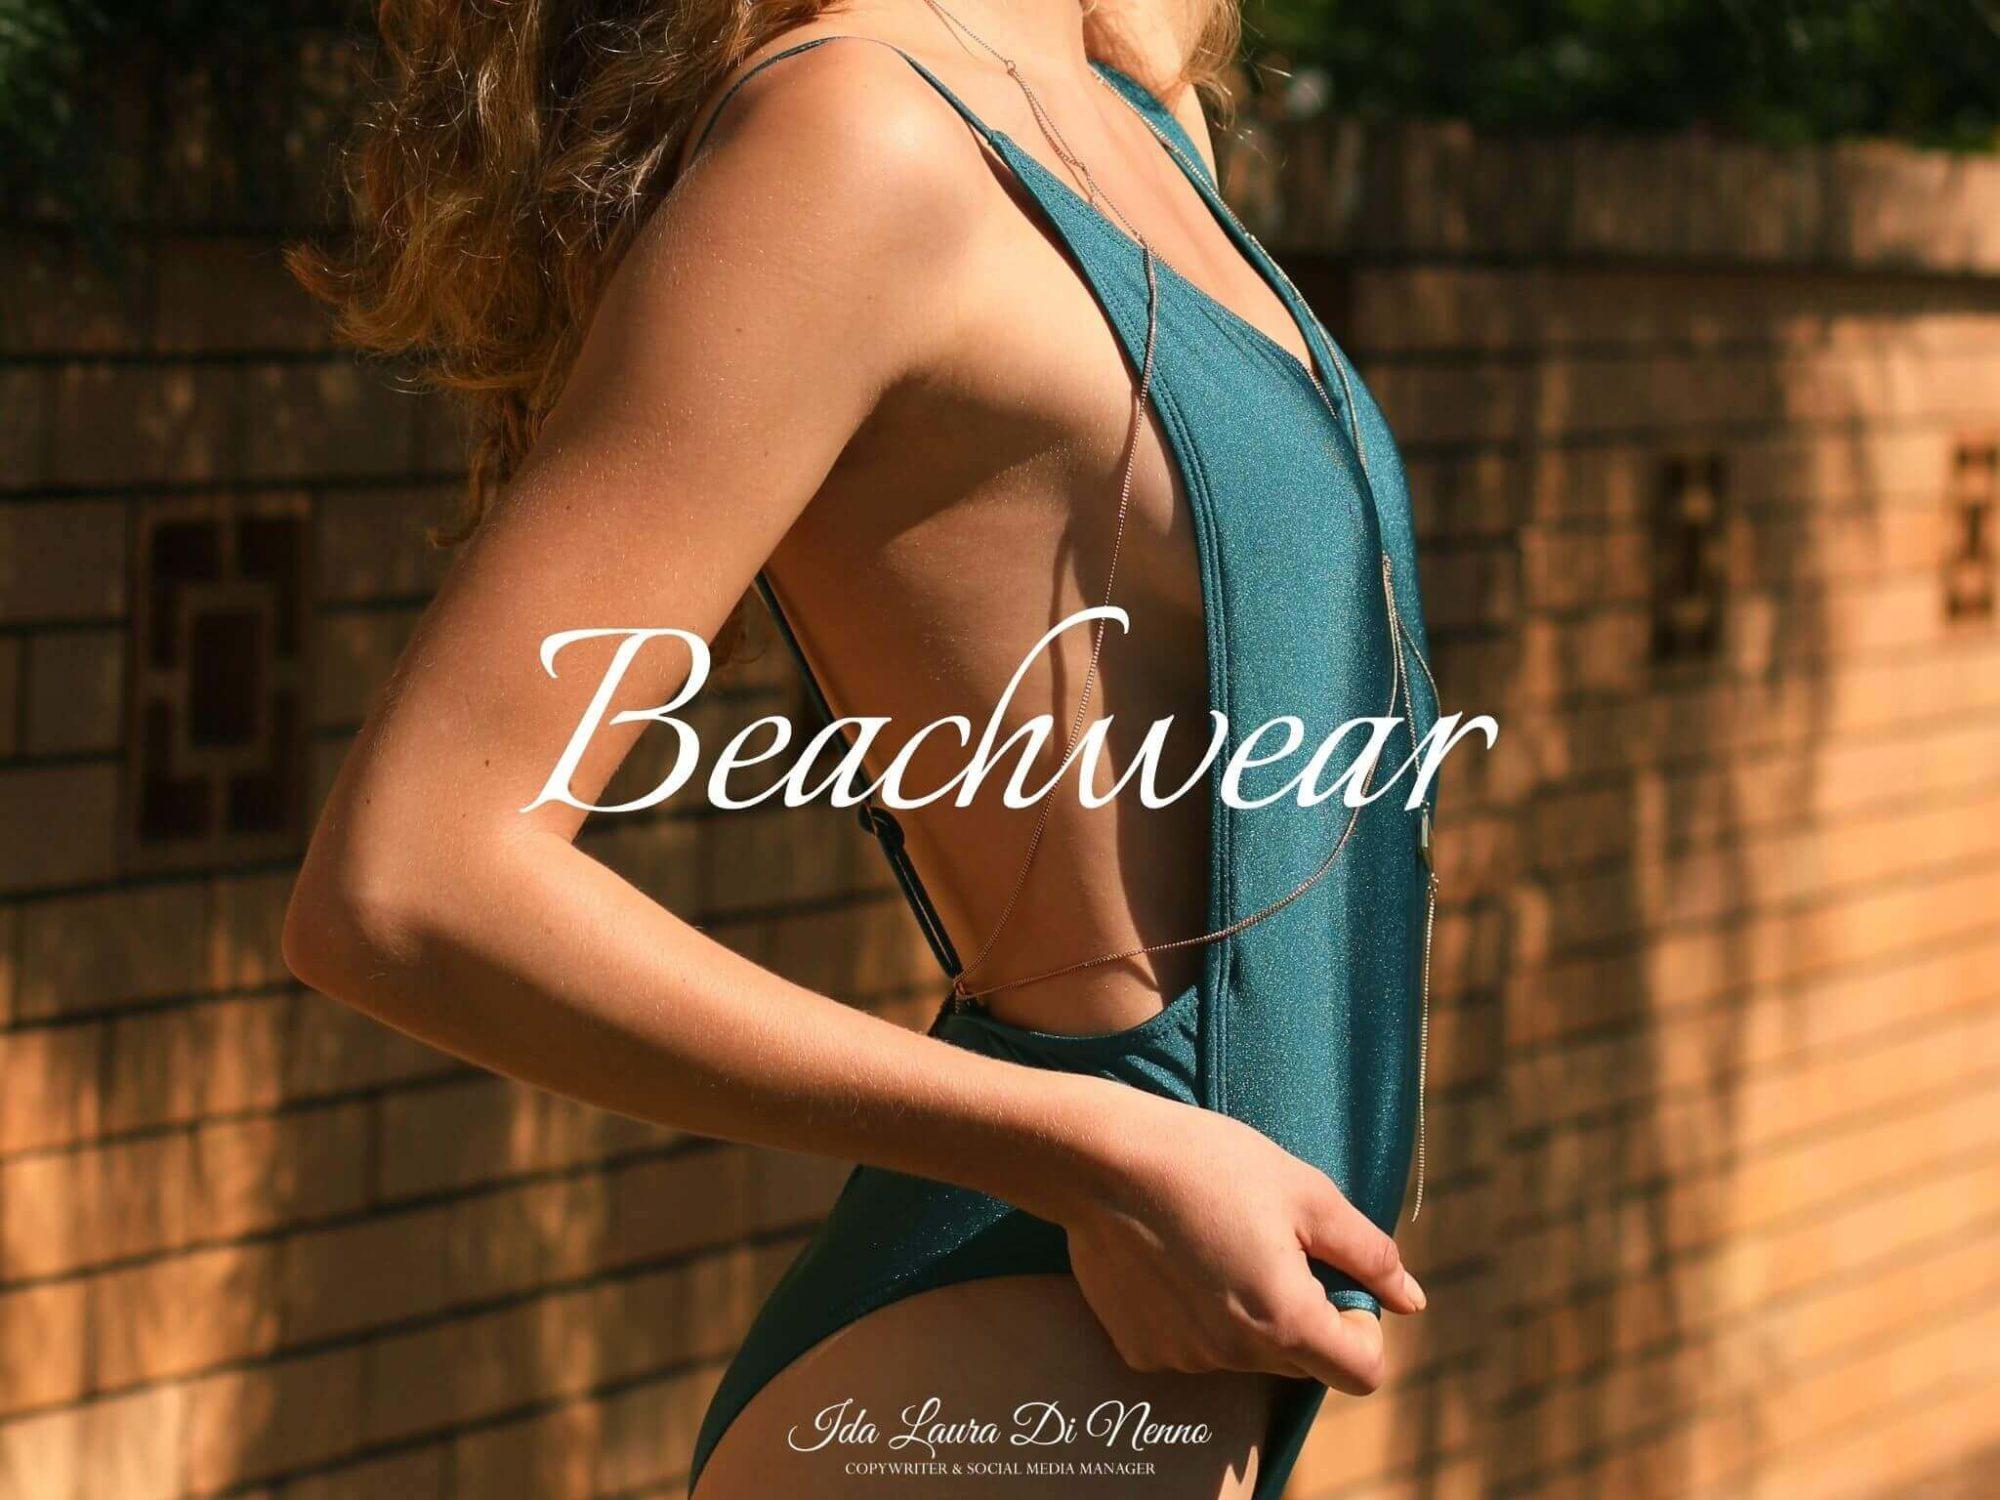 Beachwear: eleganza in riva al mare